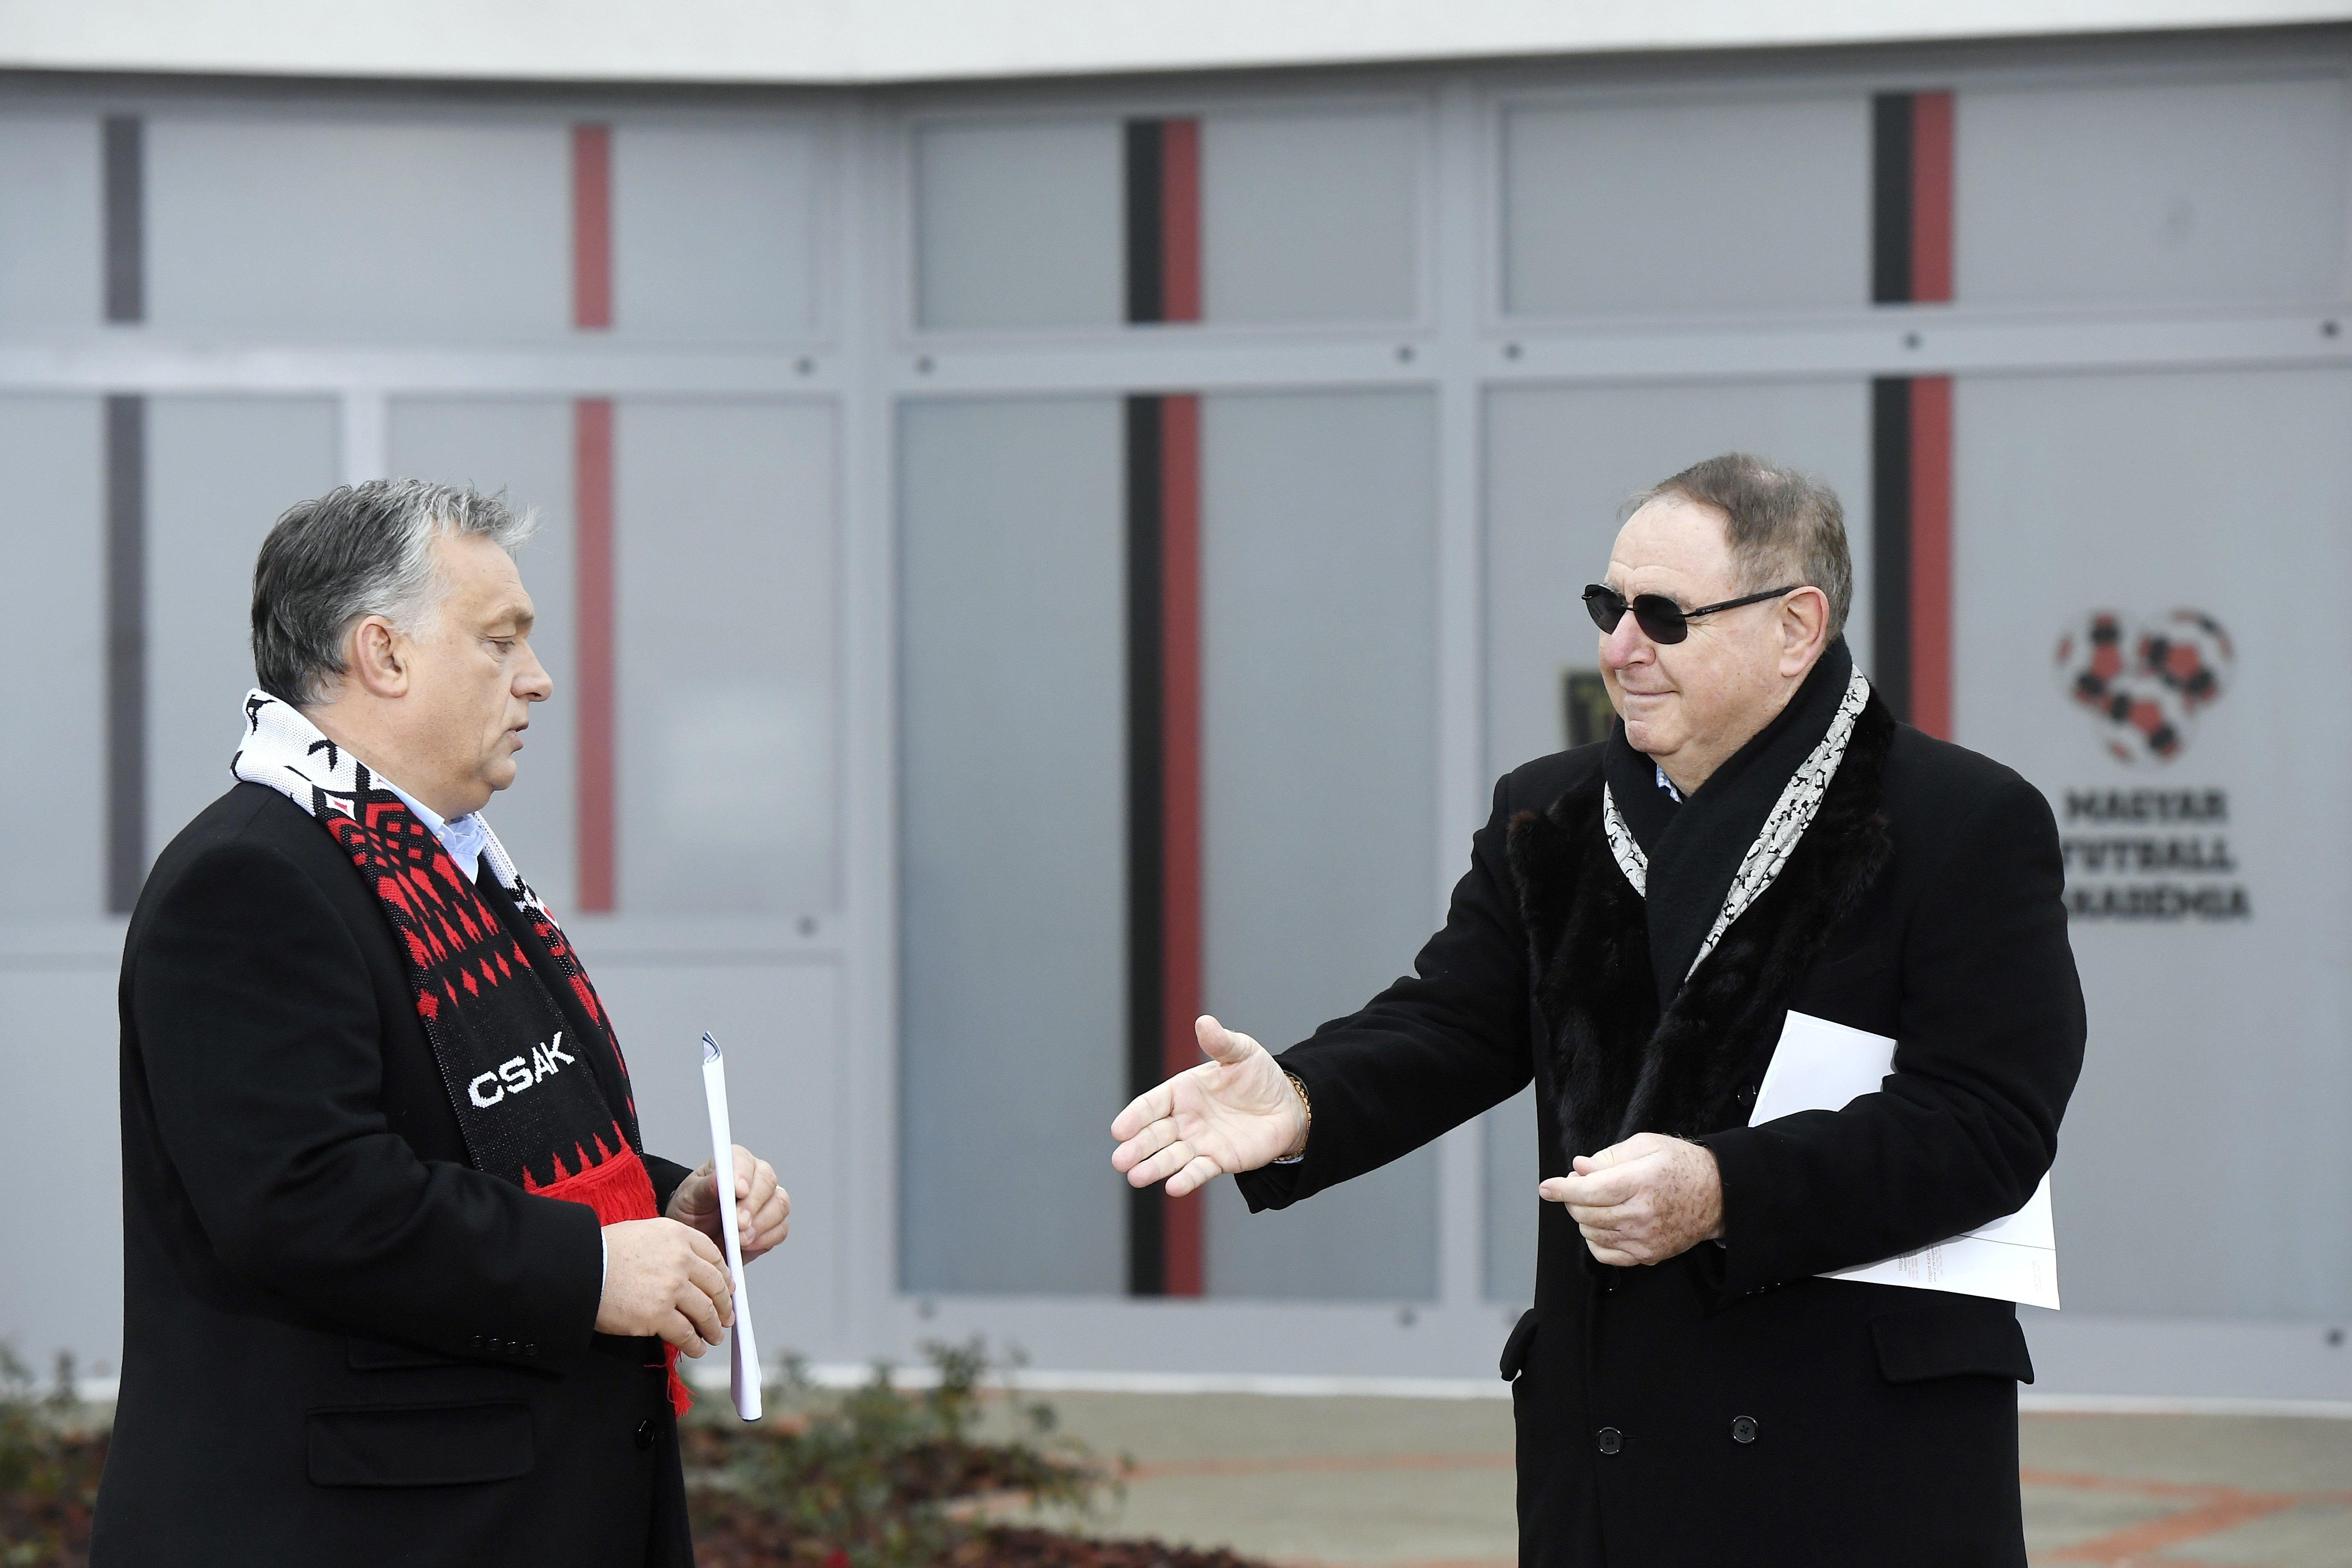 M4: Megvette a Honvédot a fideszes politikus cége